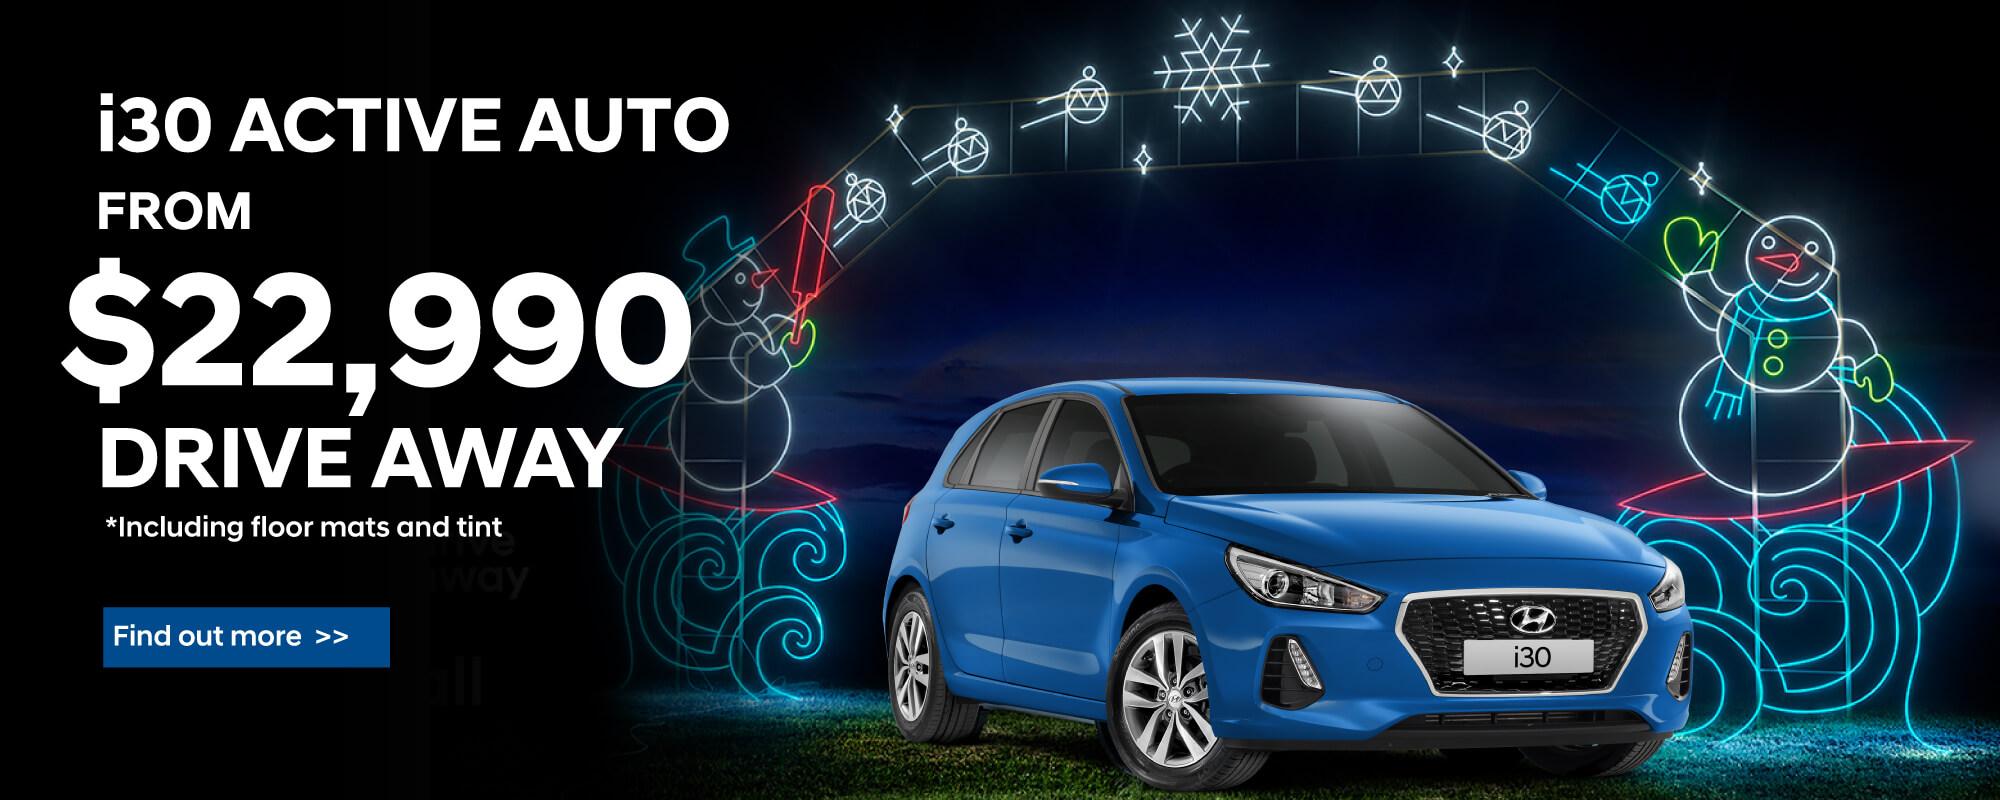 'blue hyundai i30 active auto hatch' from the web at 'http://resource.digitaldealer.com.au/image/14281931535a2a0afa134b1675306771_0_0.jpg'